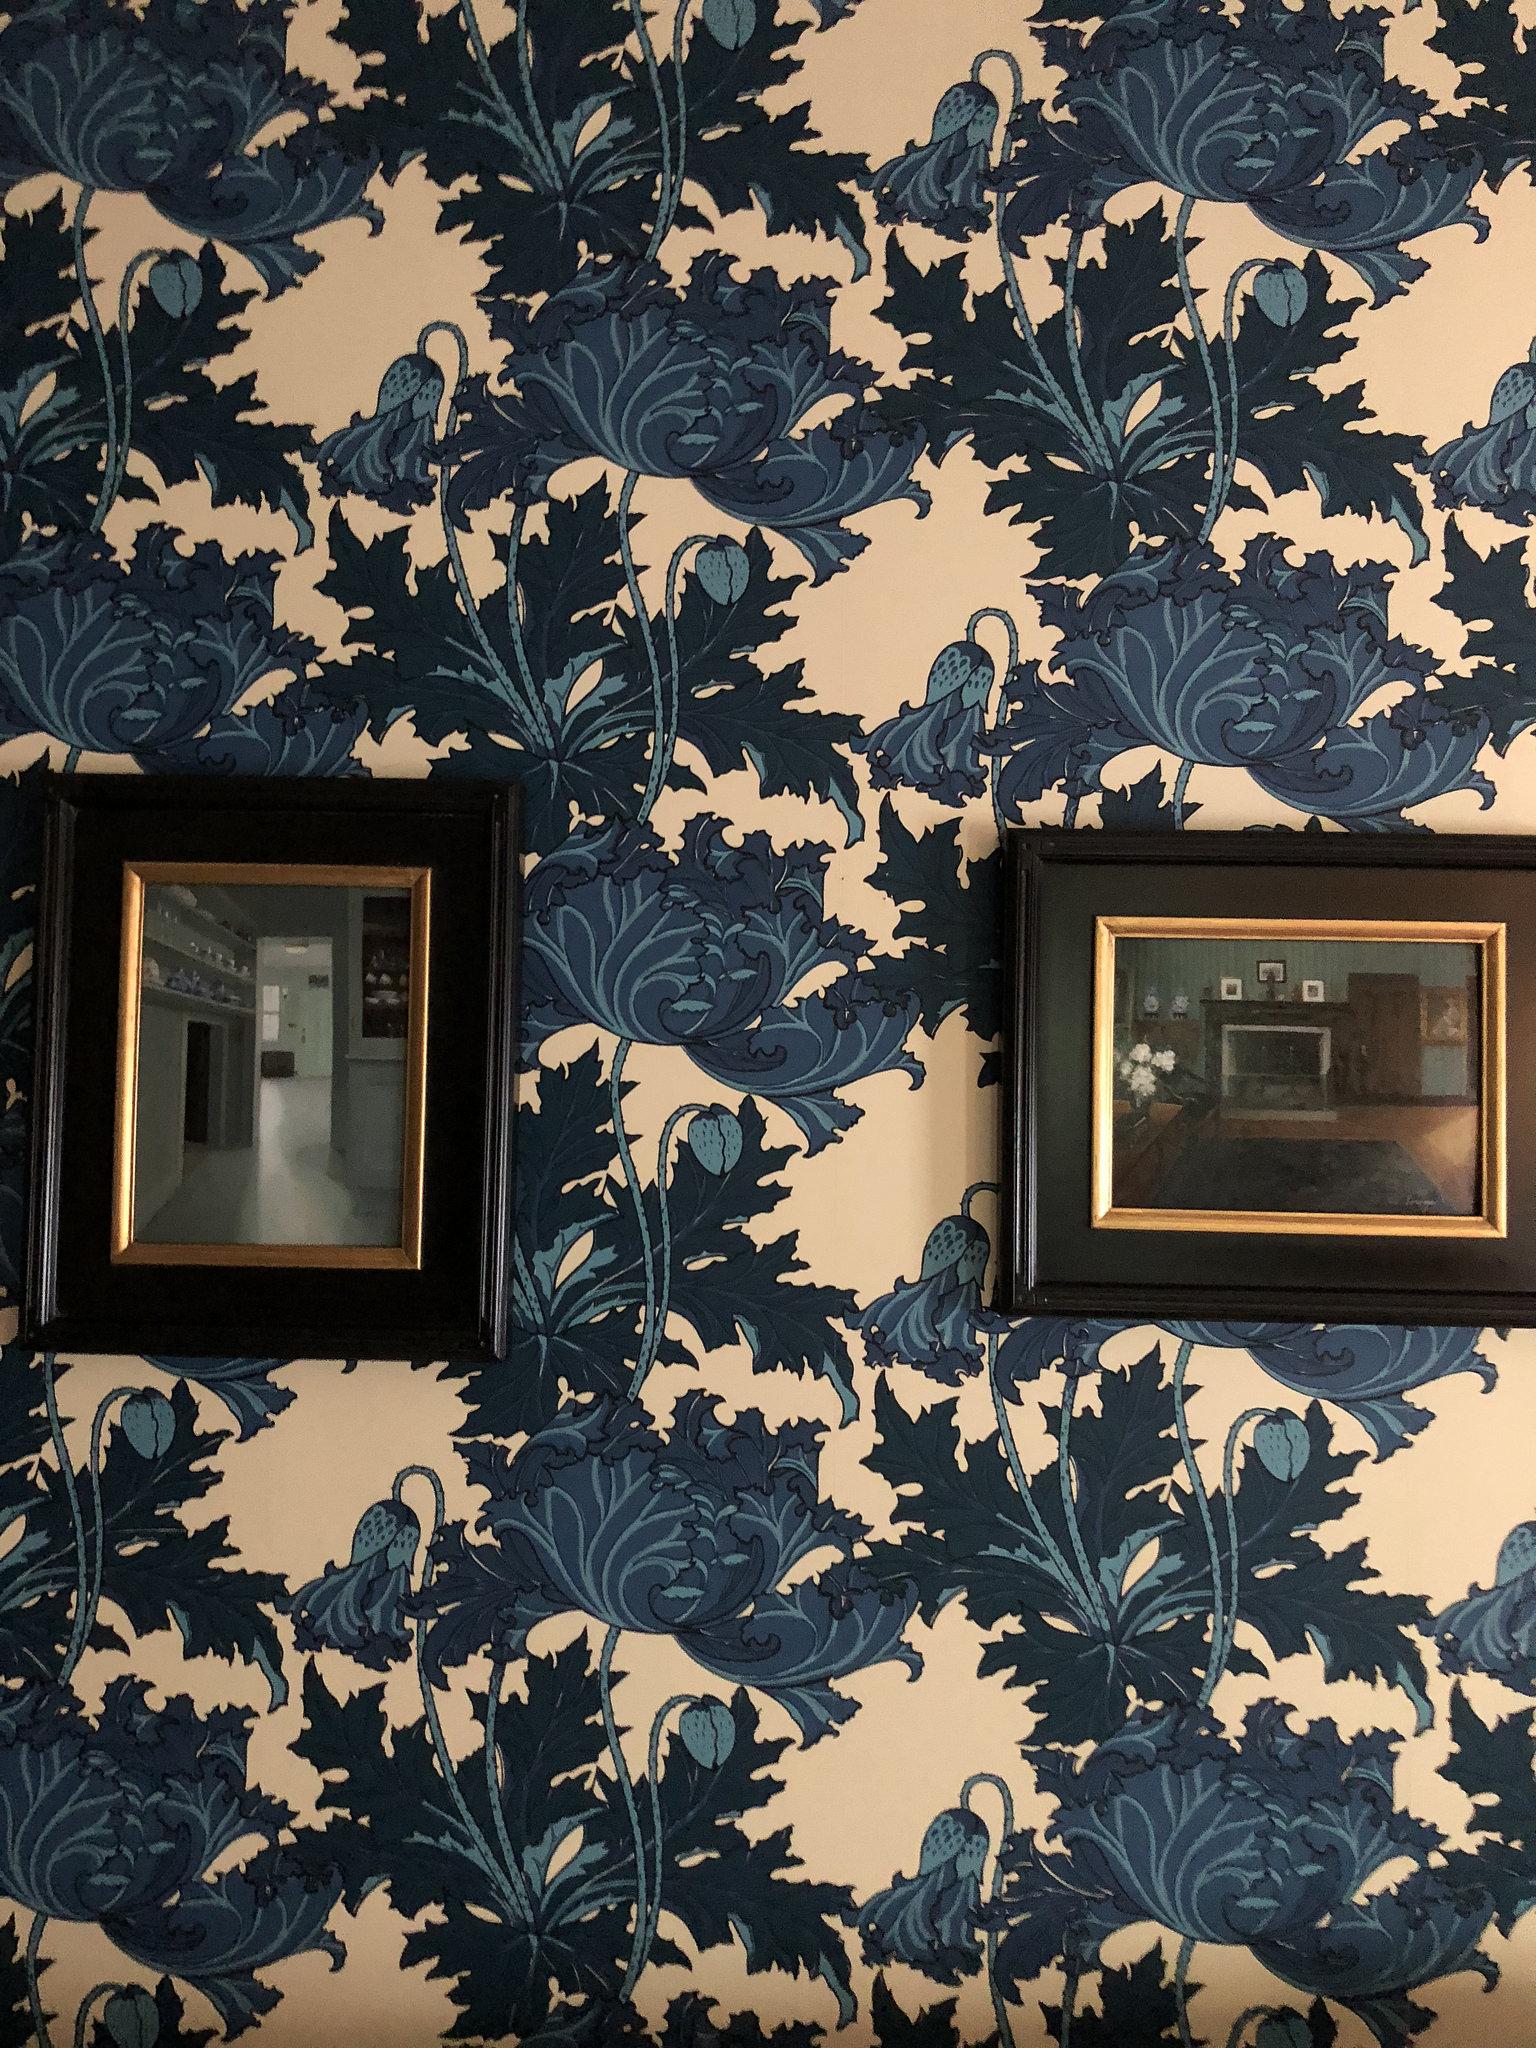 Wallpaper in Weir's house